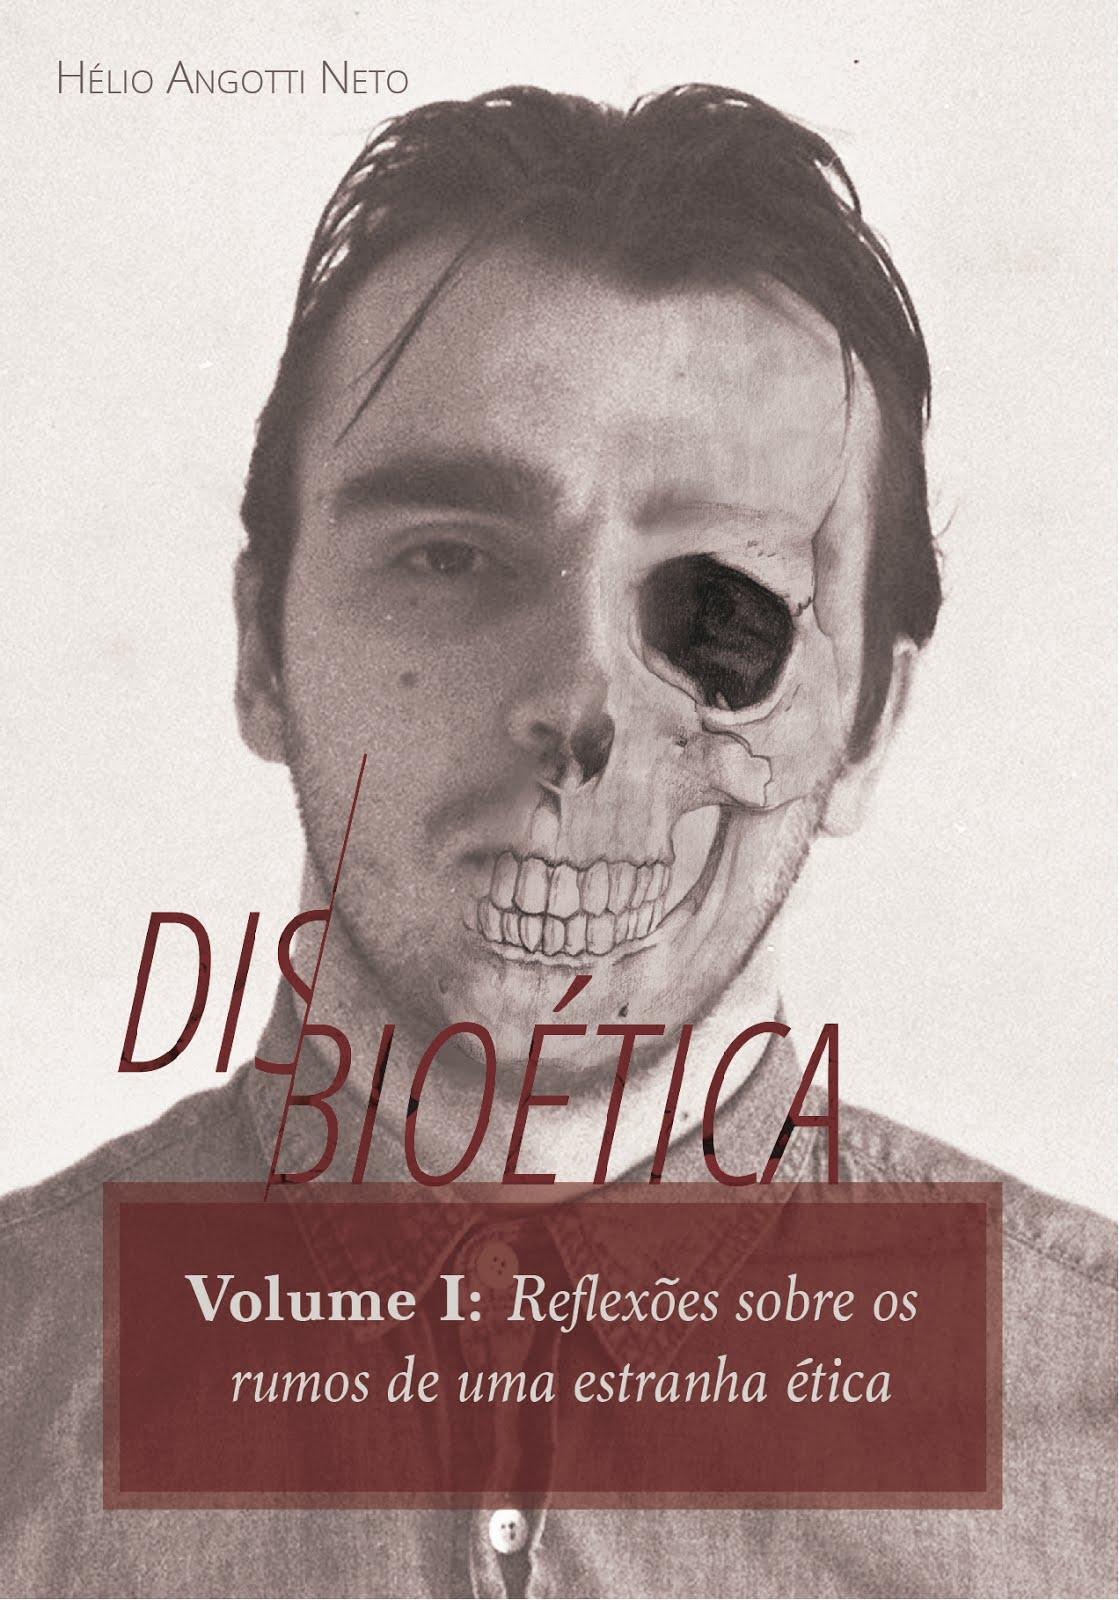 DISBIOÉTICA VOLUME I